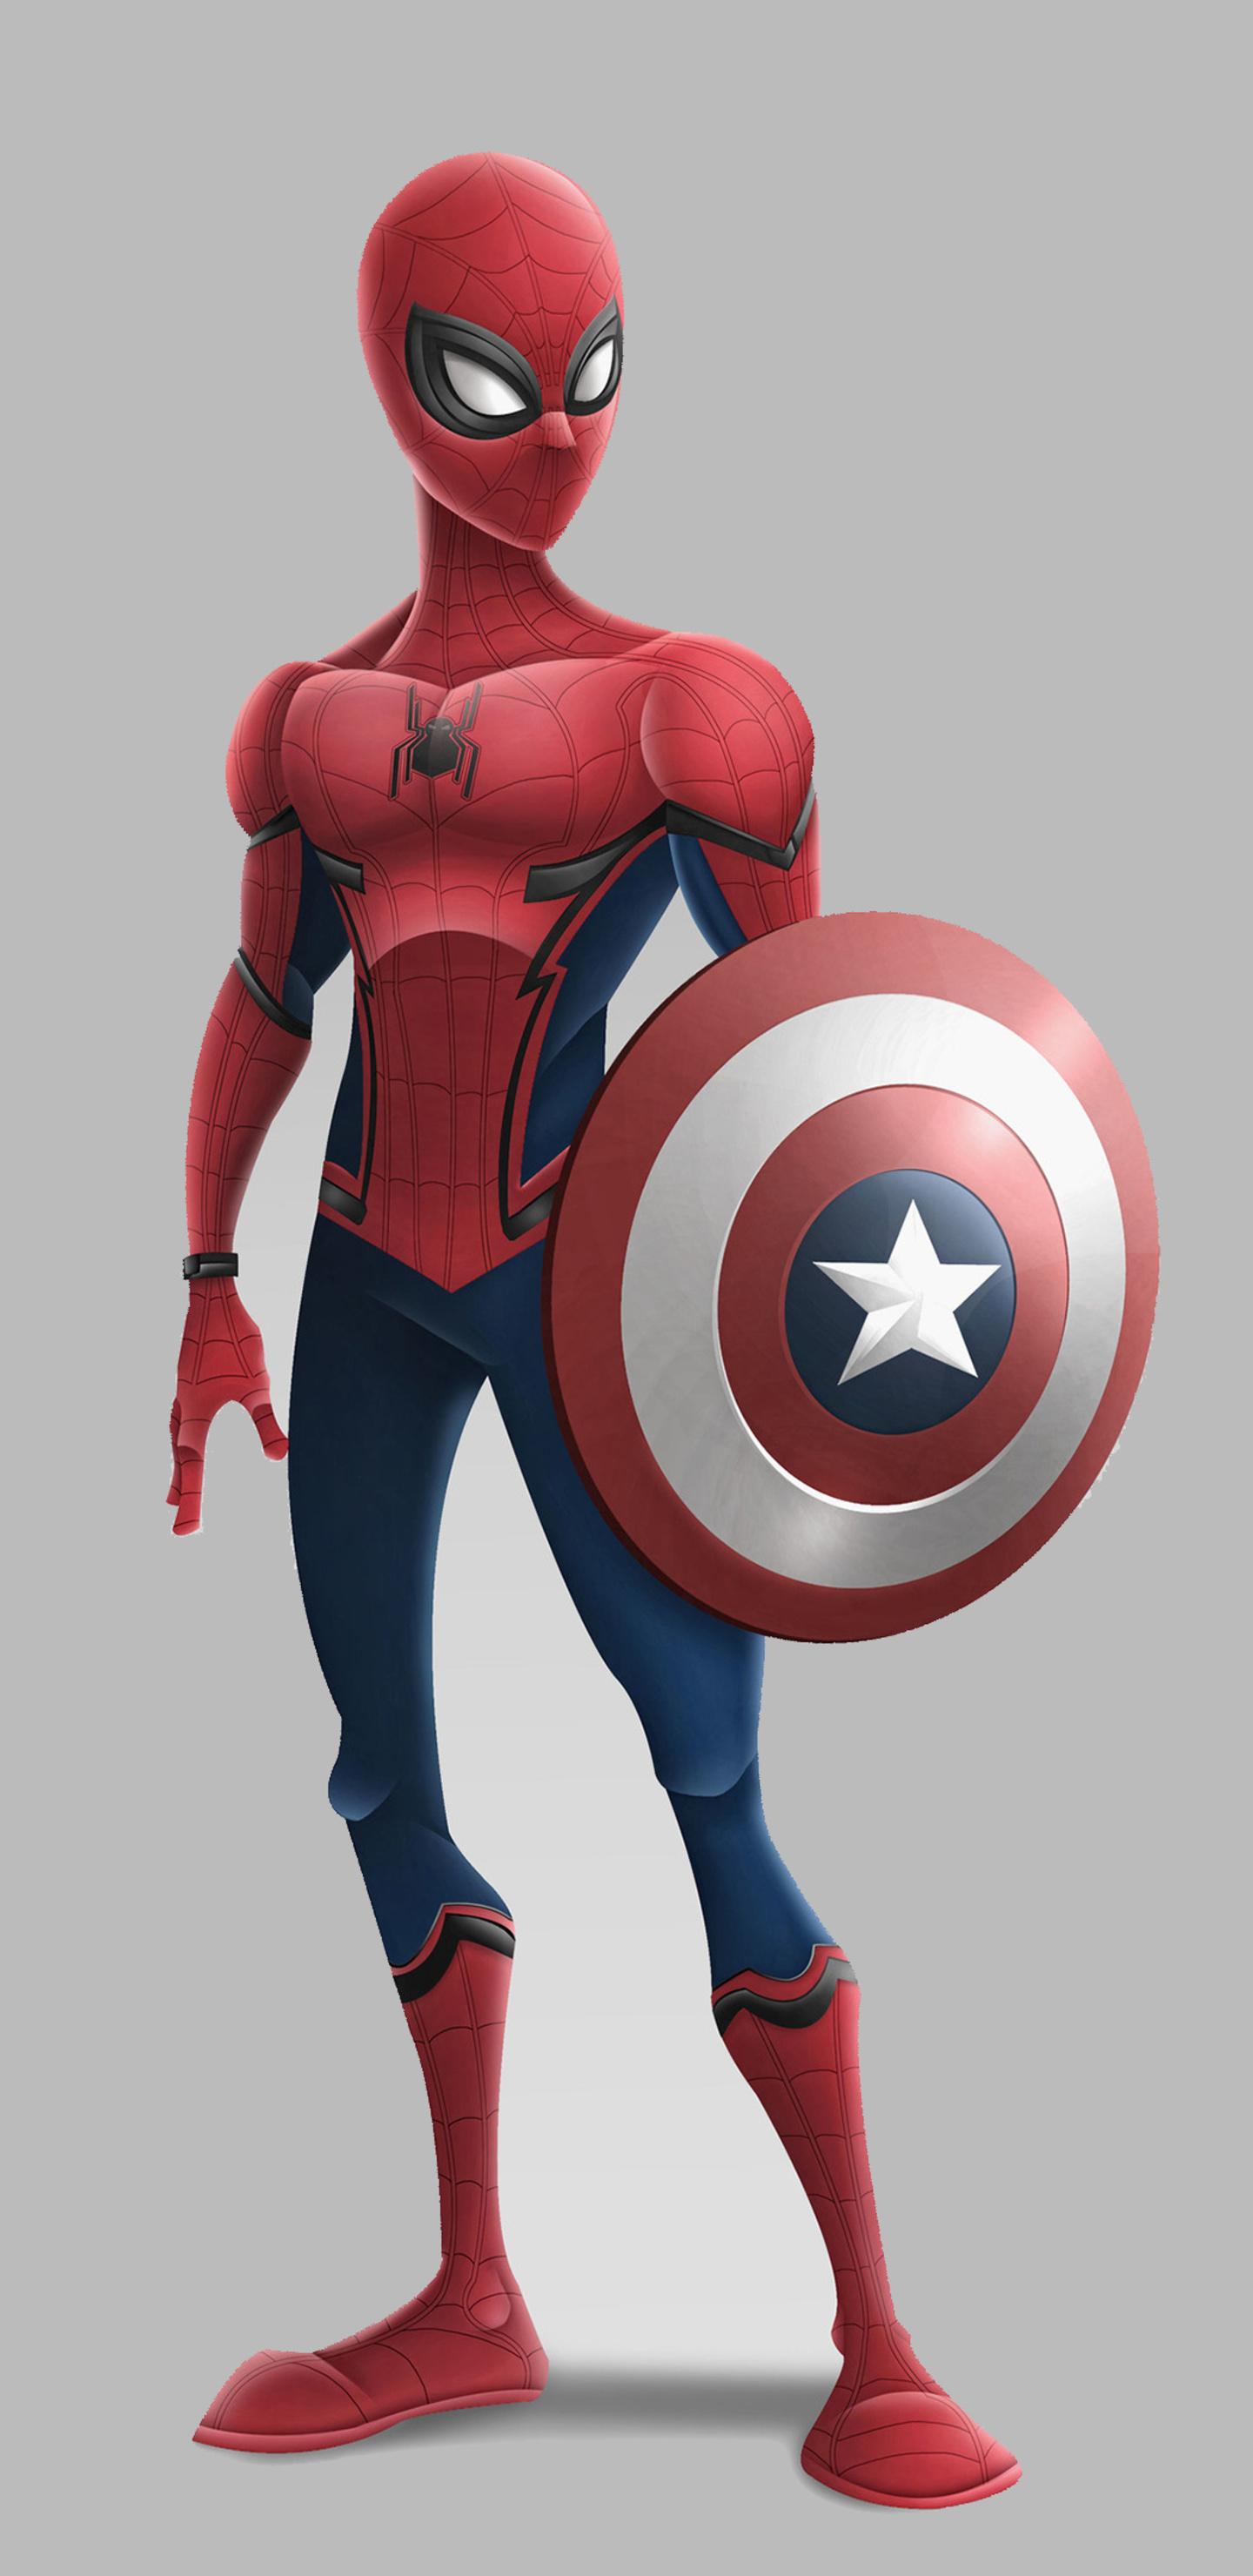 spiderman-with-captain-america-shield-4w.jpg